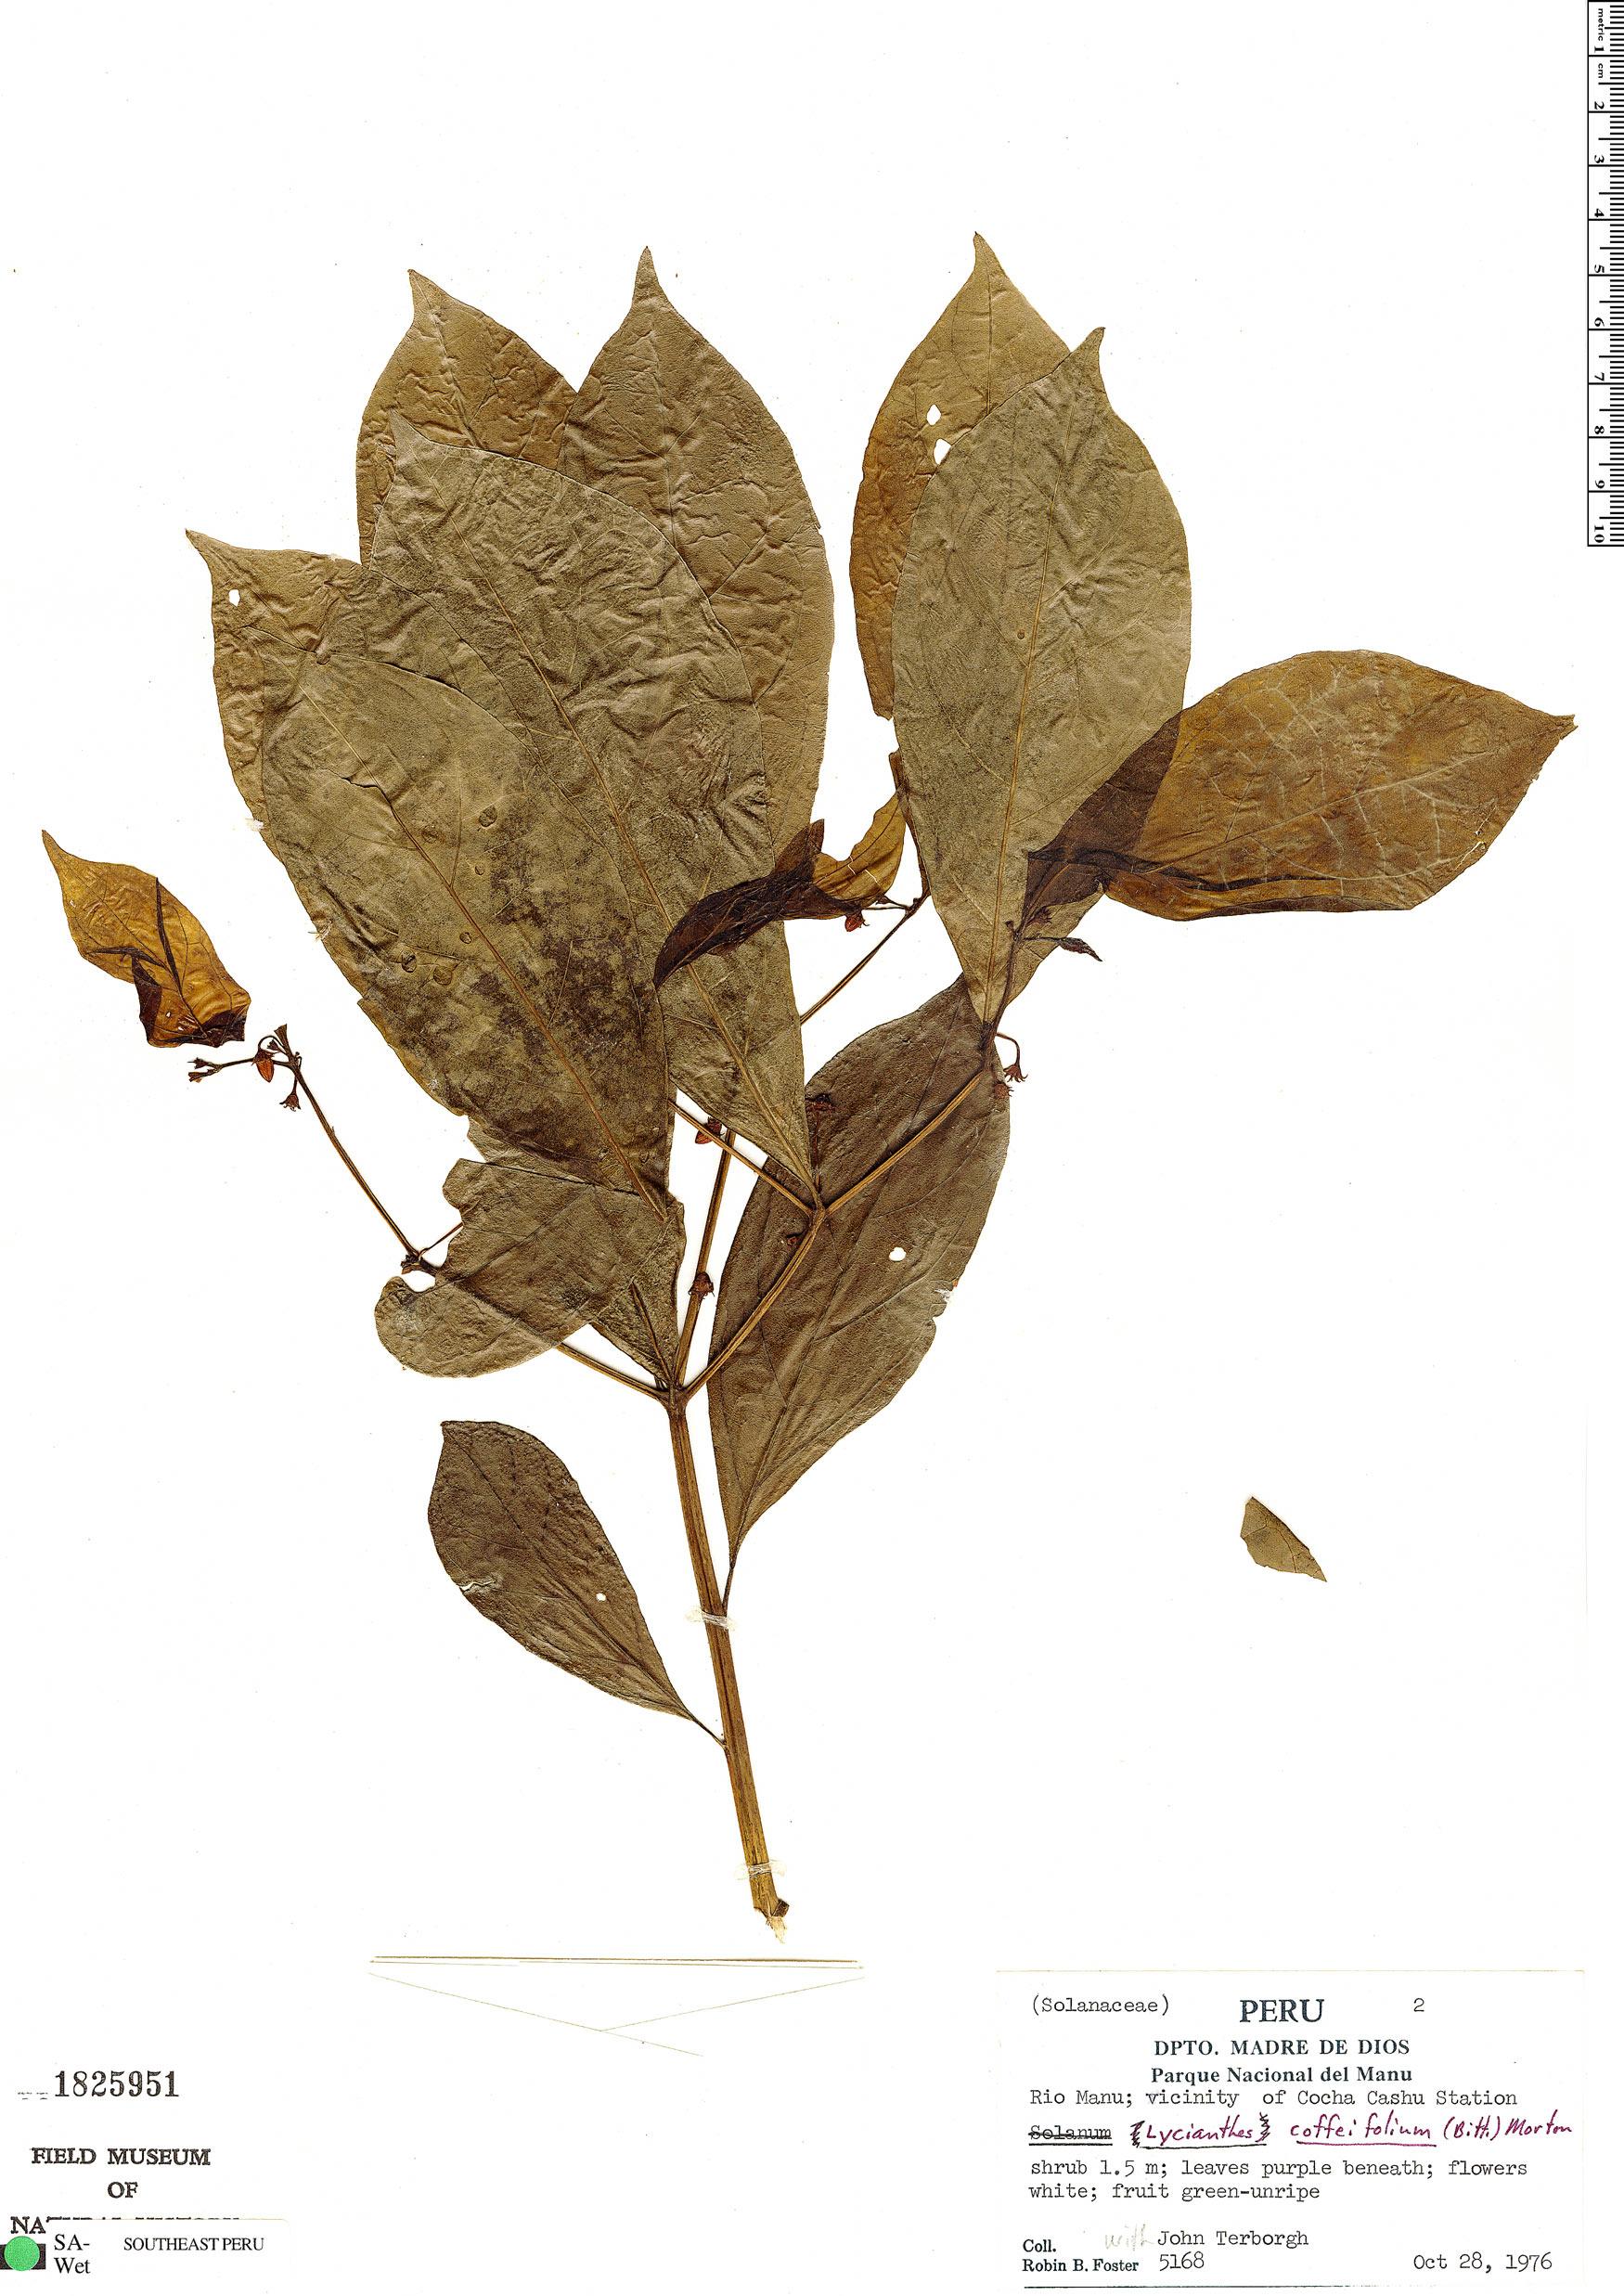 Specimen: Lycianthes coffeifolia